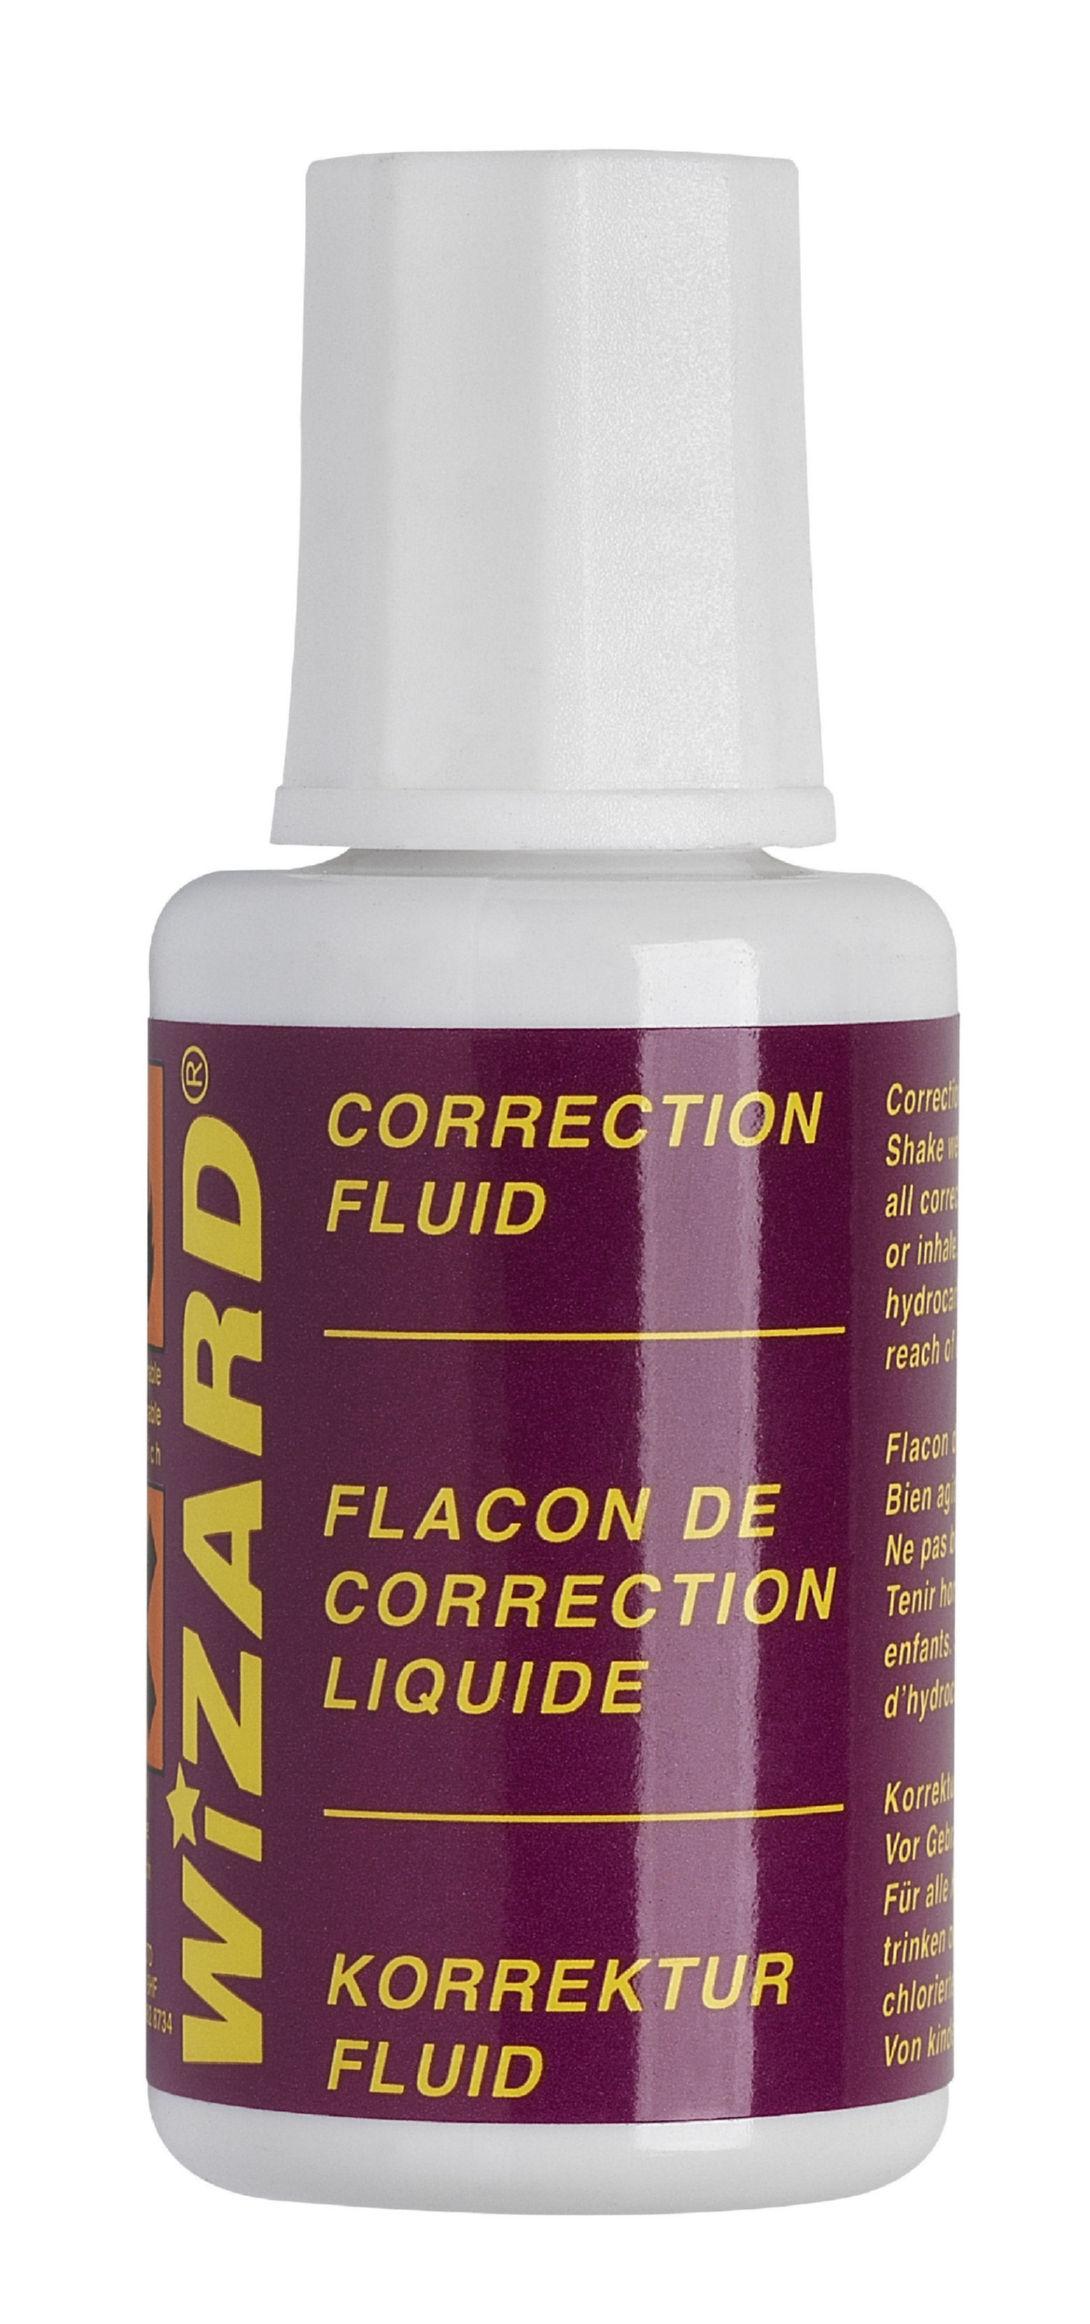 Correction Fluid ValueX Correction Fluid Bottle 20ml White (Pack 10)